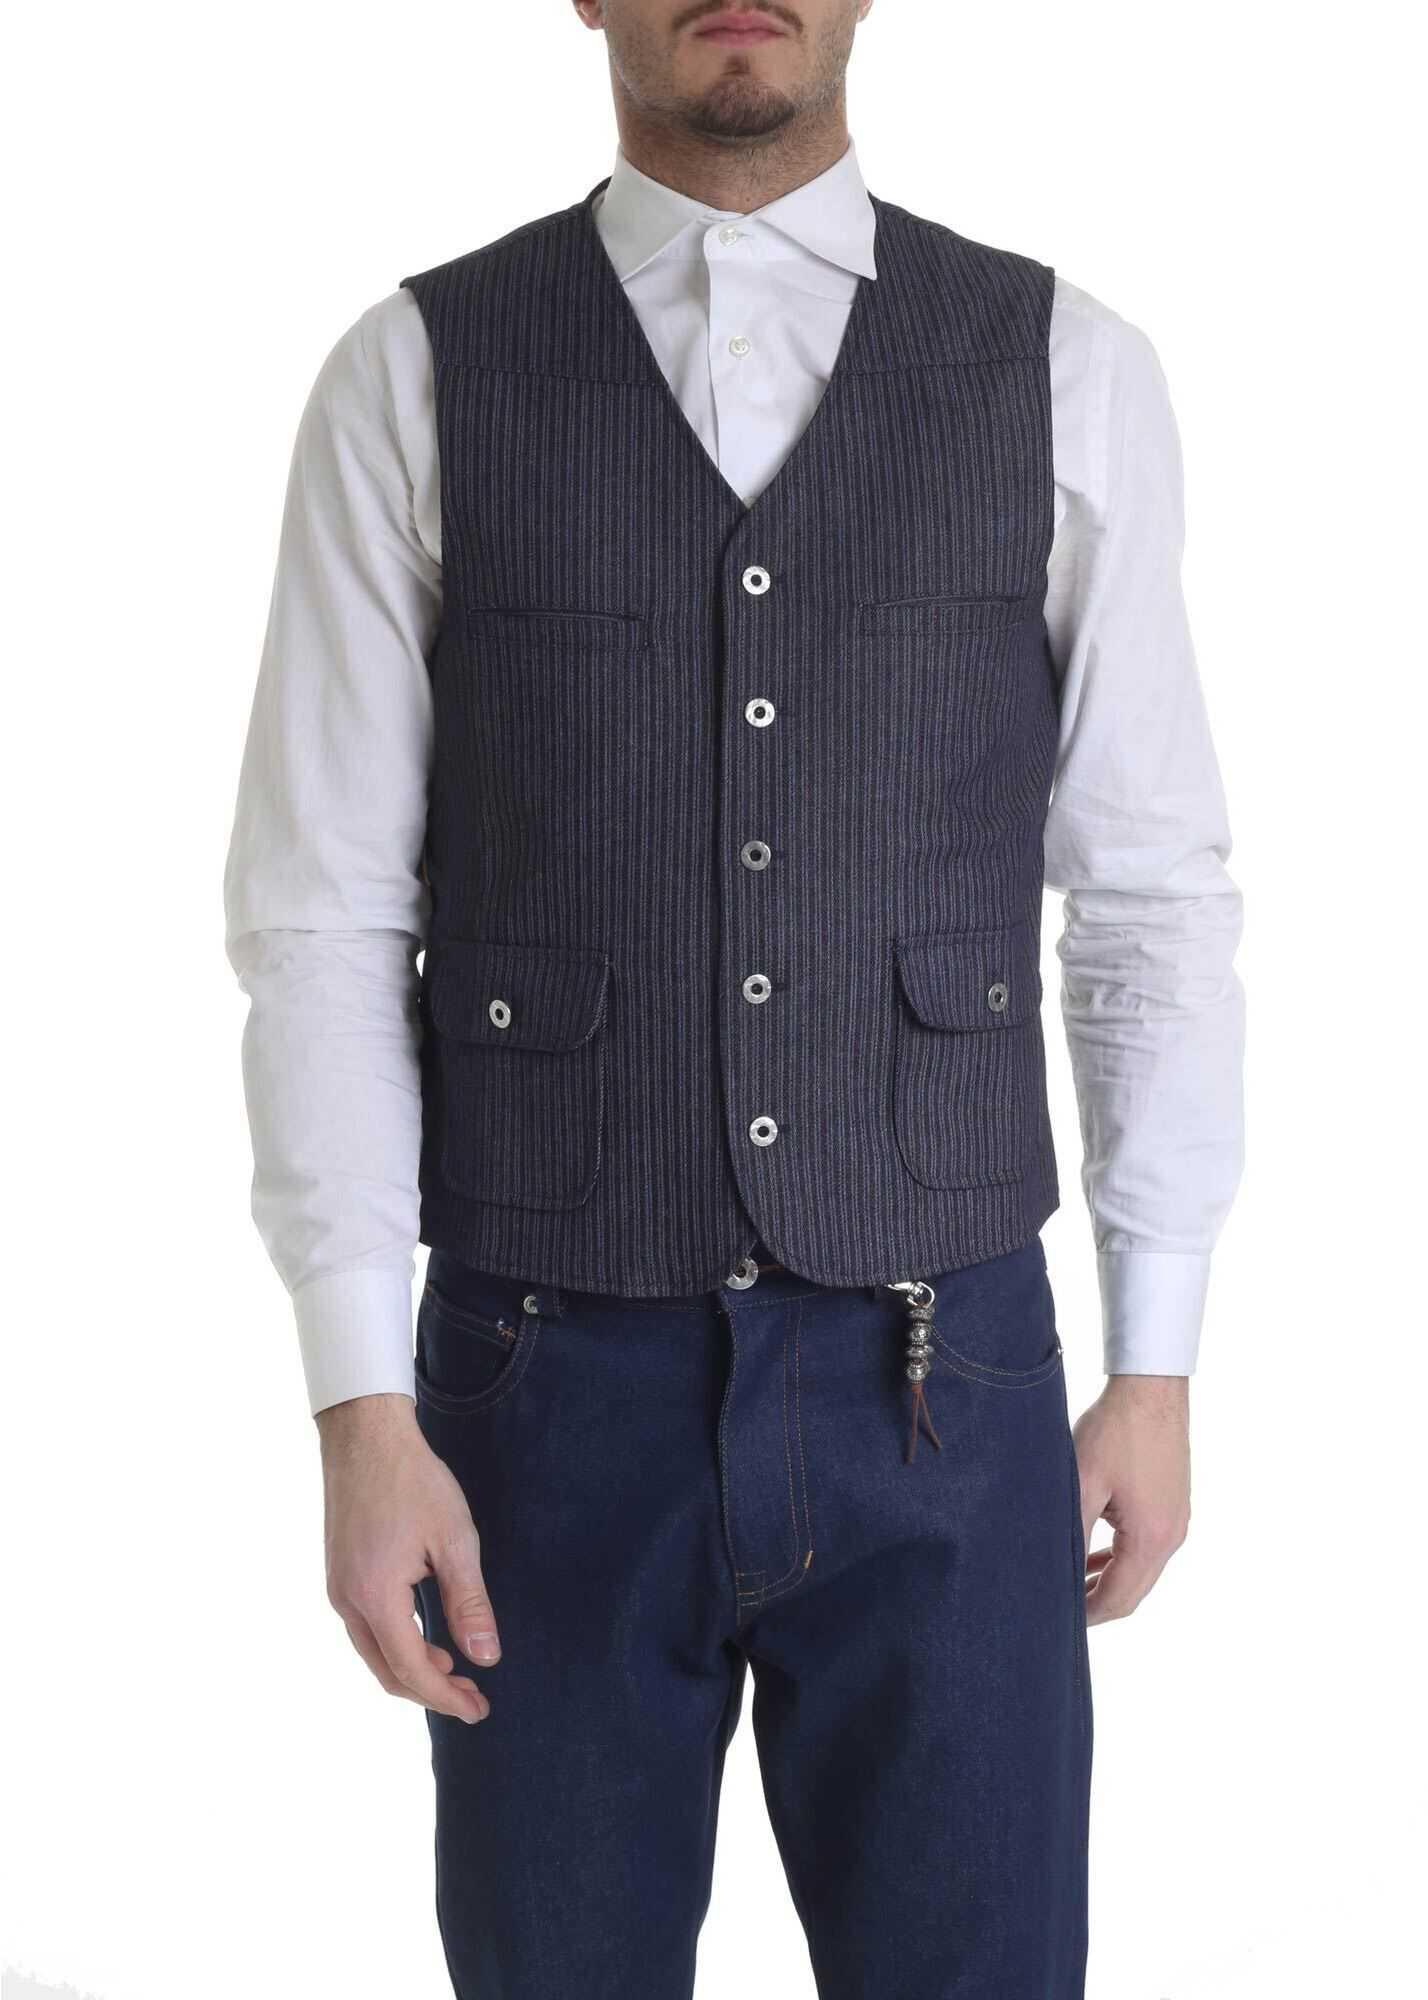 Ribbon Clothing Blue And White Waistcoat With Stripes Blue imagine